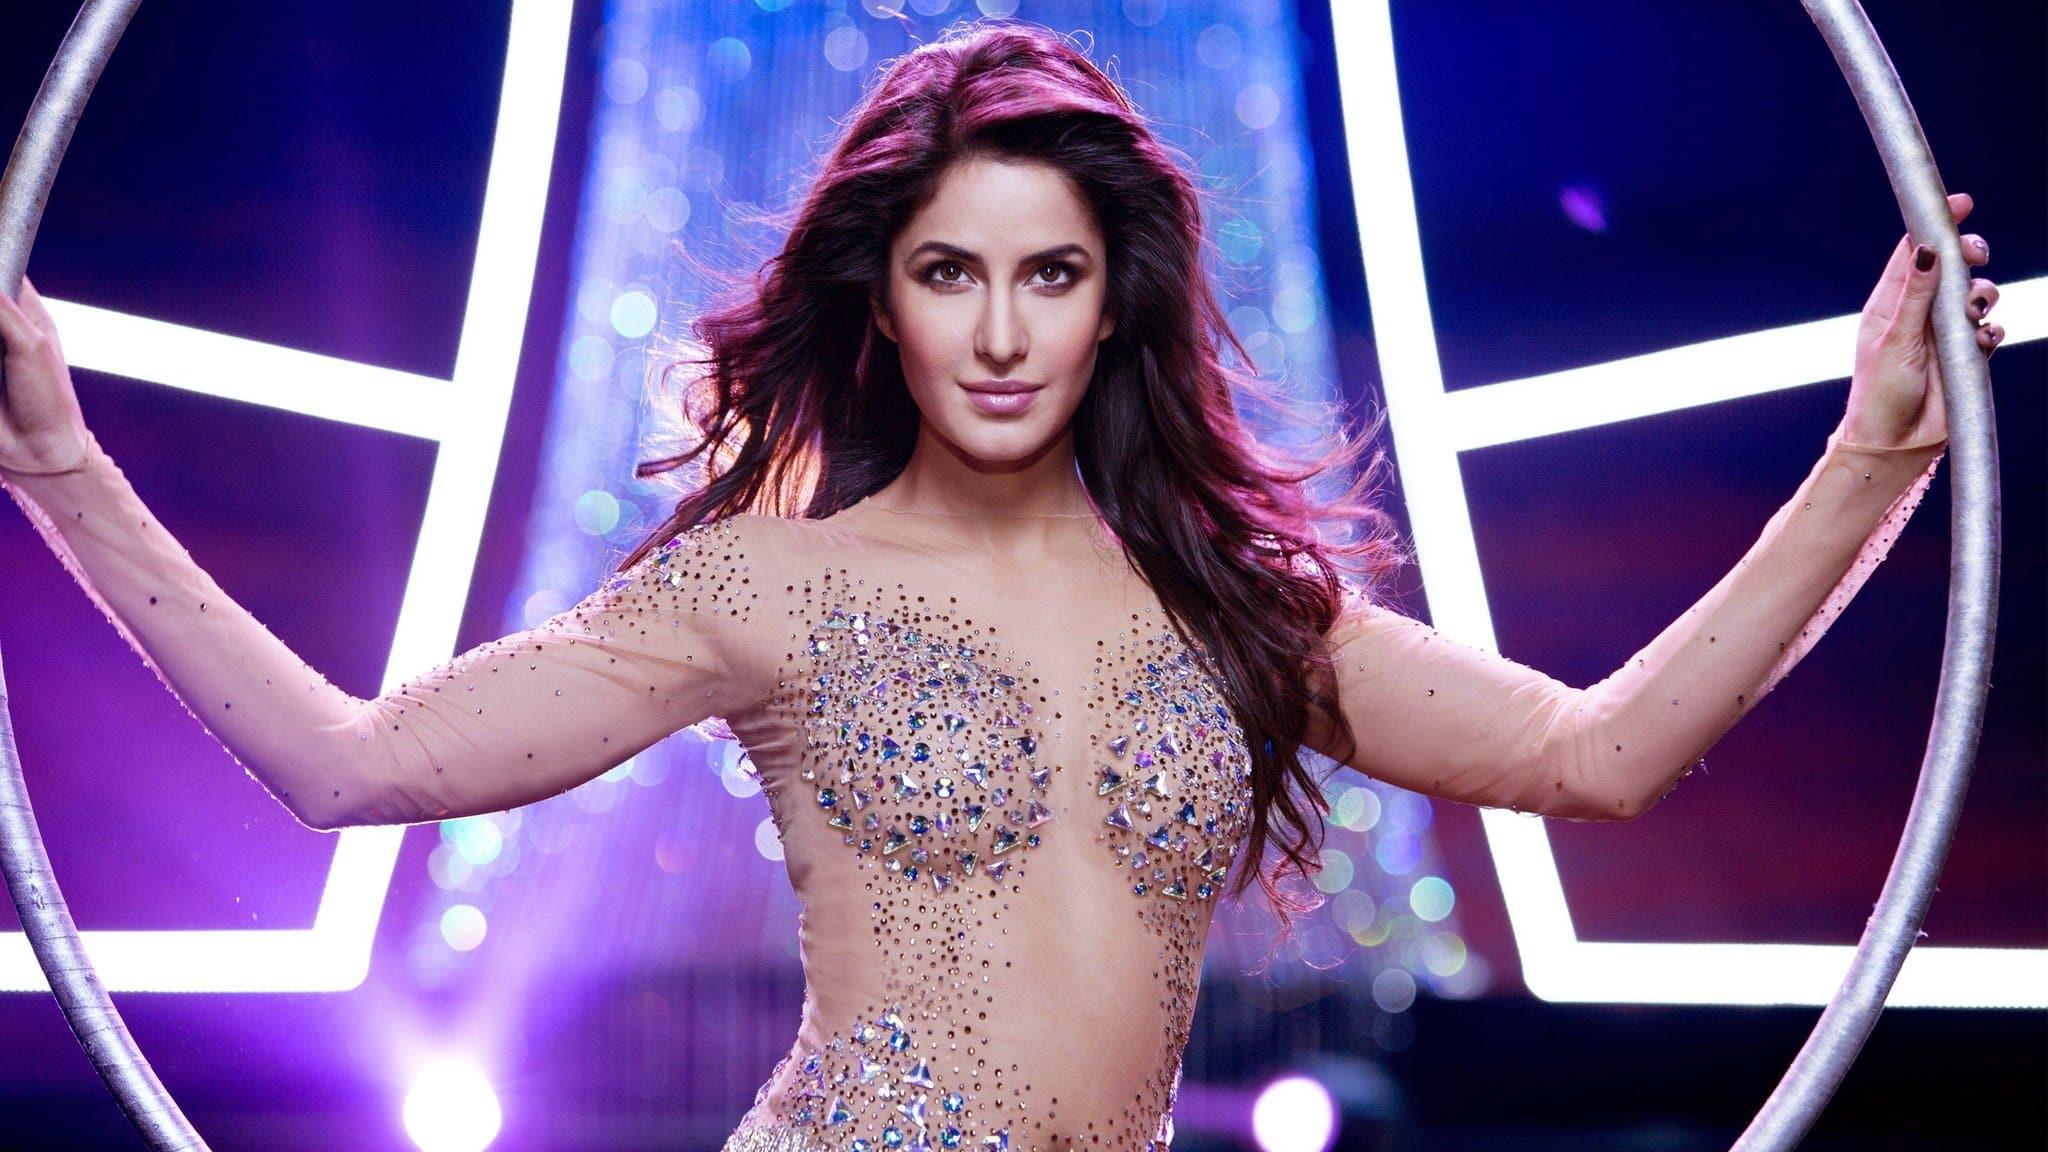 कैटरीना-कैफ-लोकप्रिय-अभिनेत्री-Katrina kaif india ke bahar sabse famous heroine hai